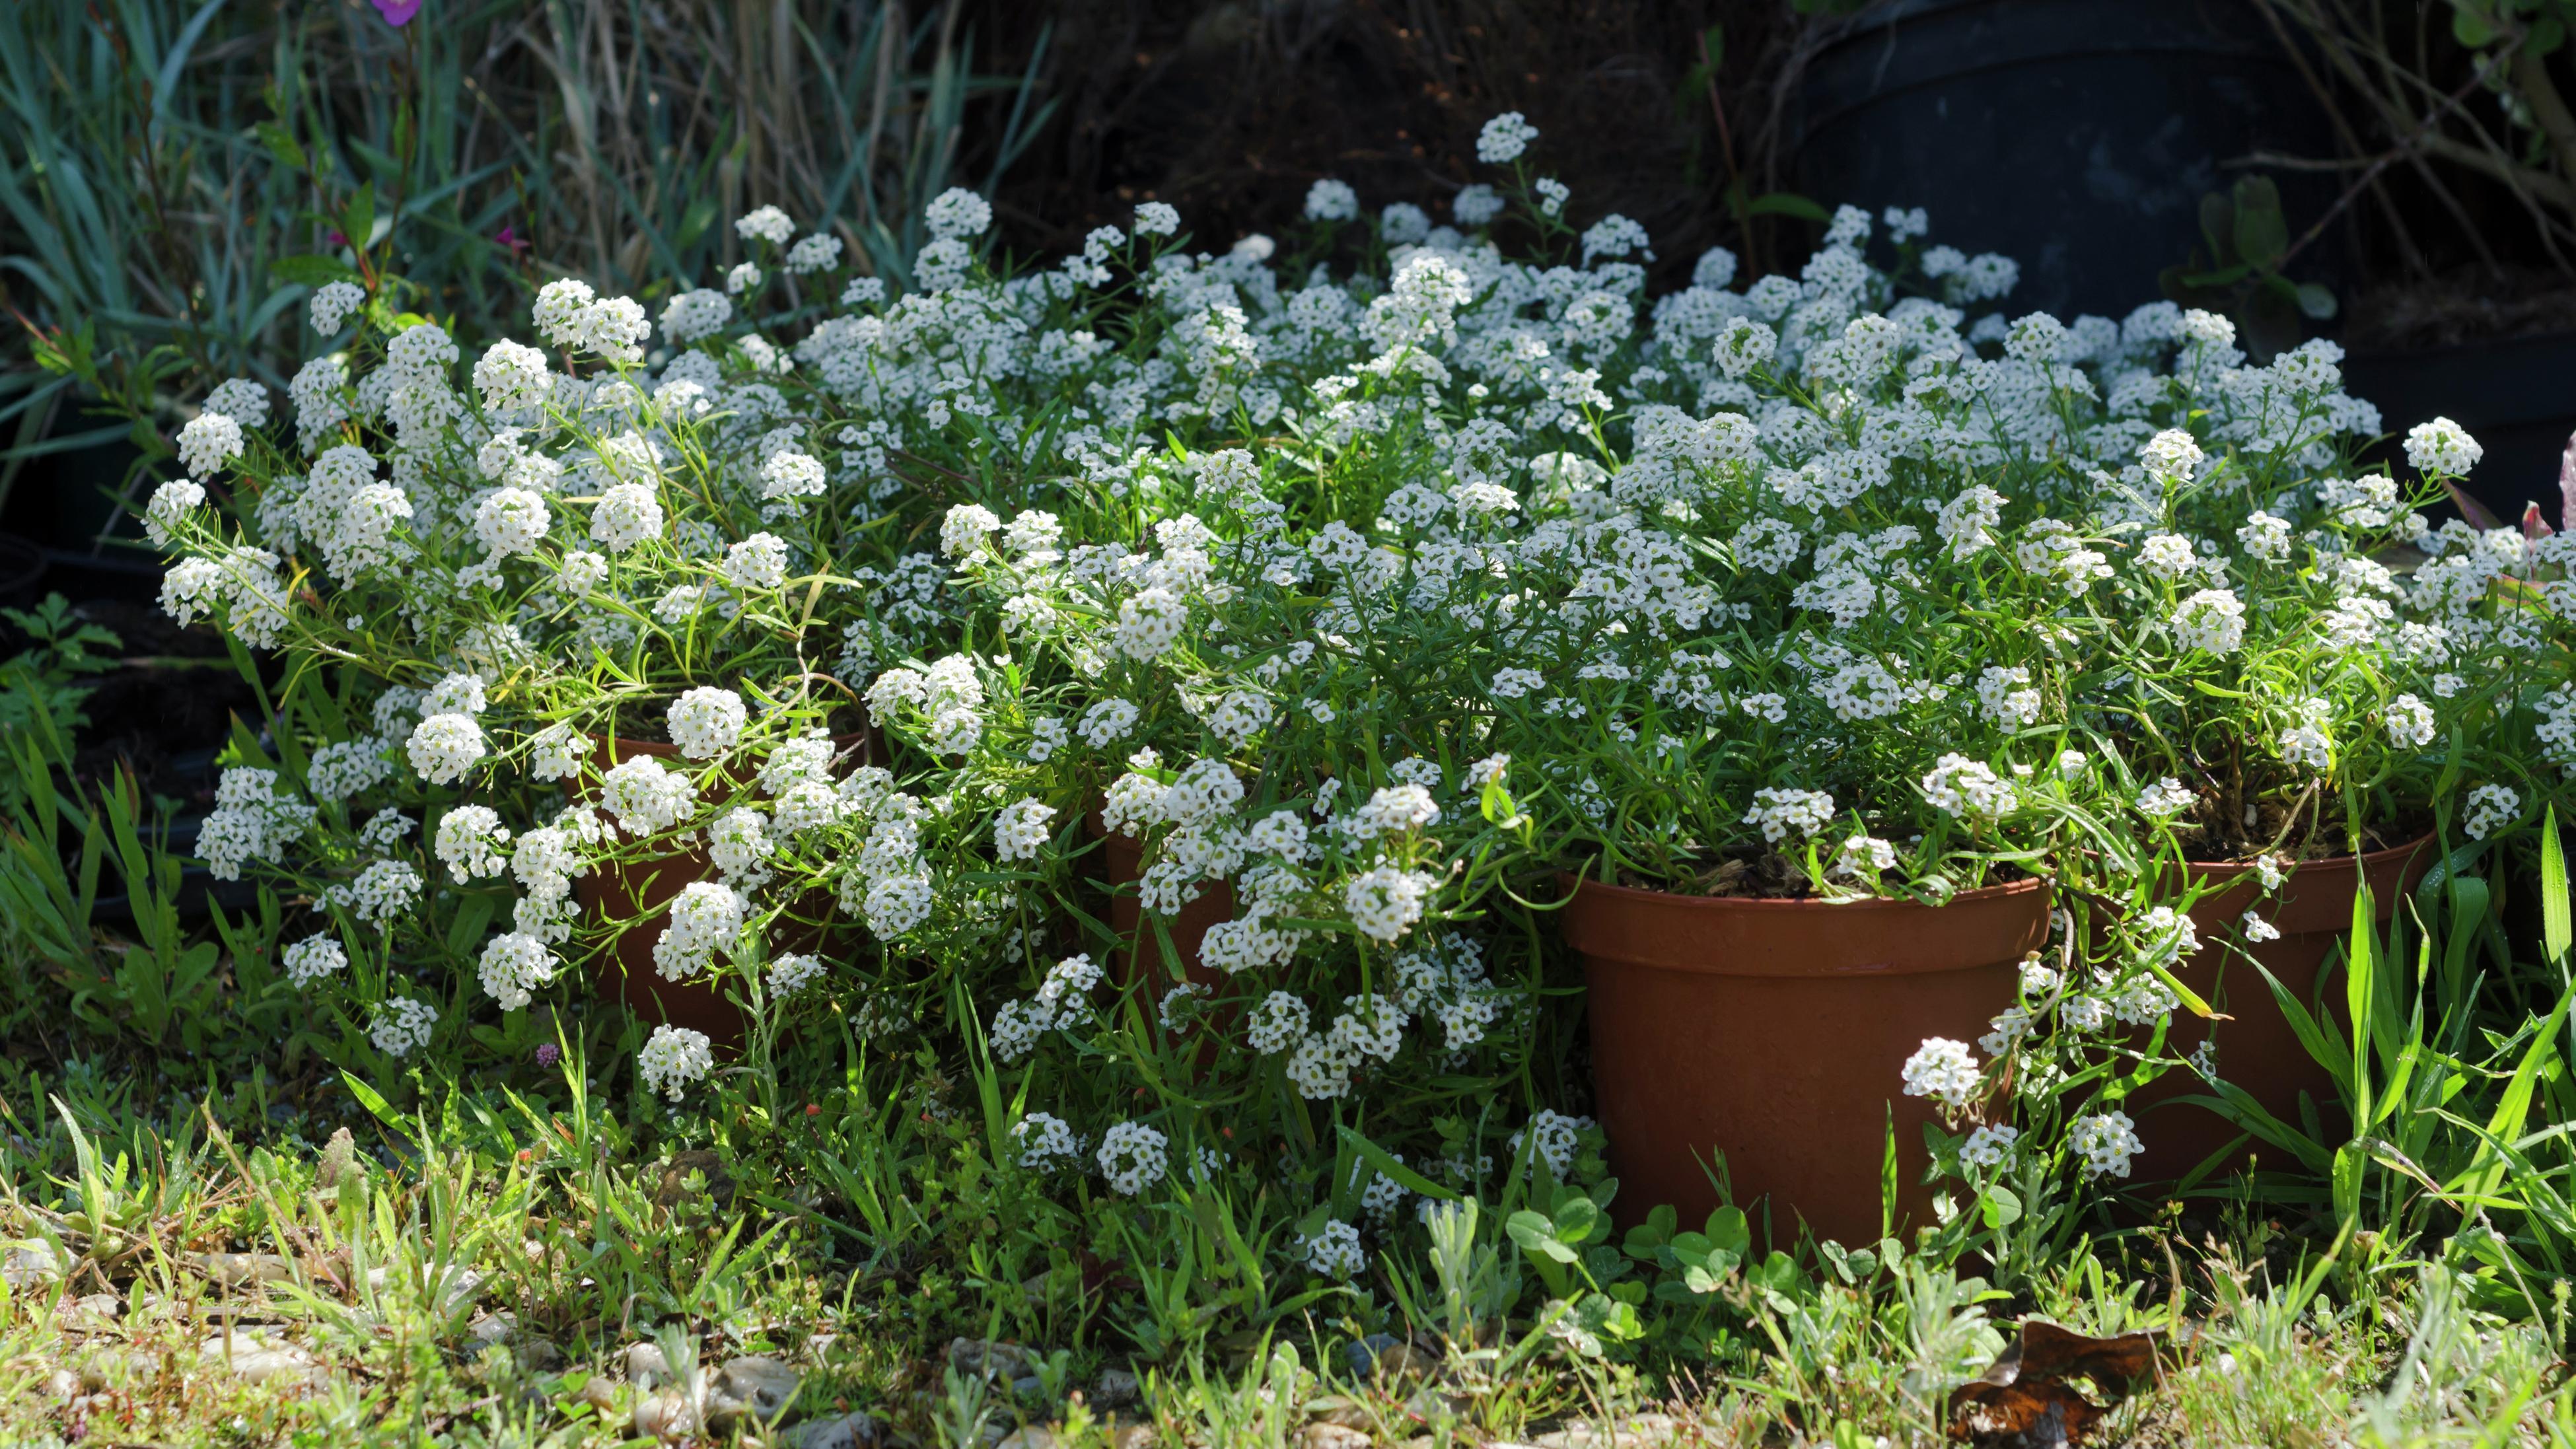 Sweet alyssum plants growing in terracotta pots